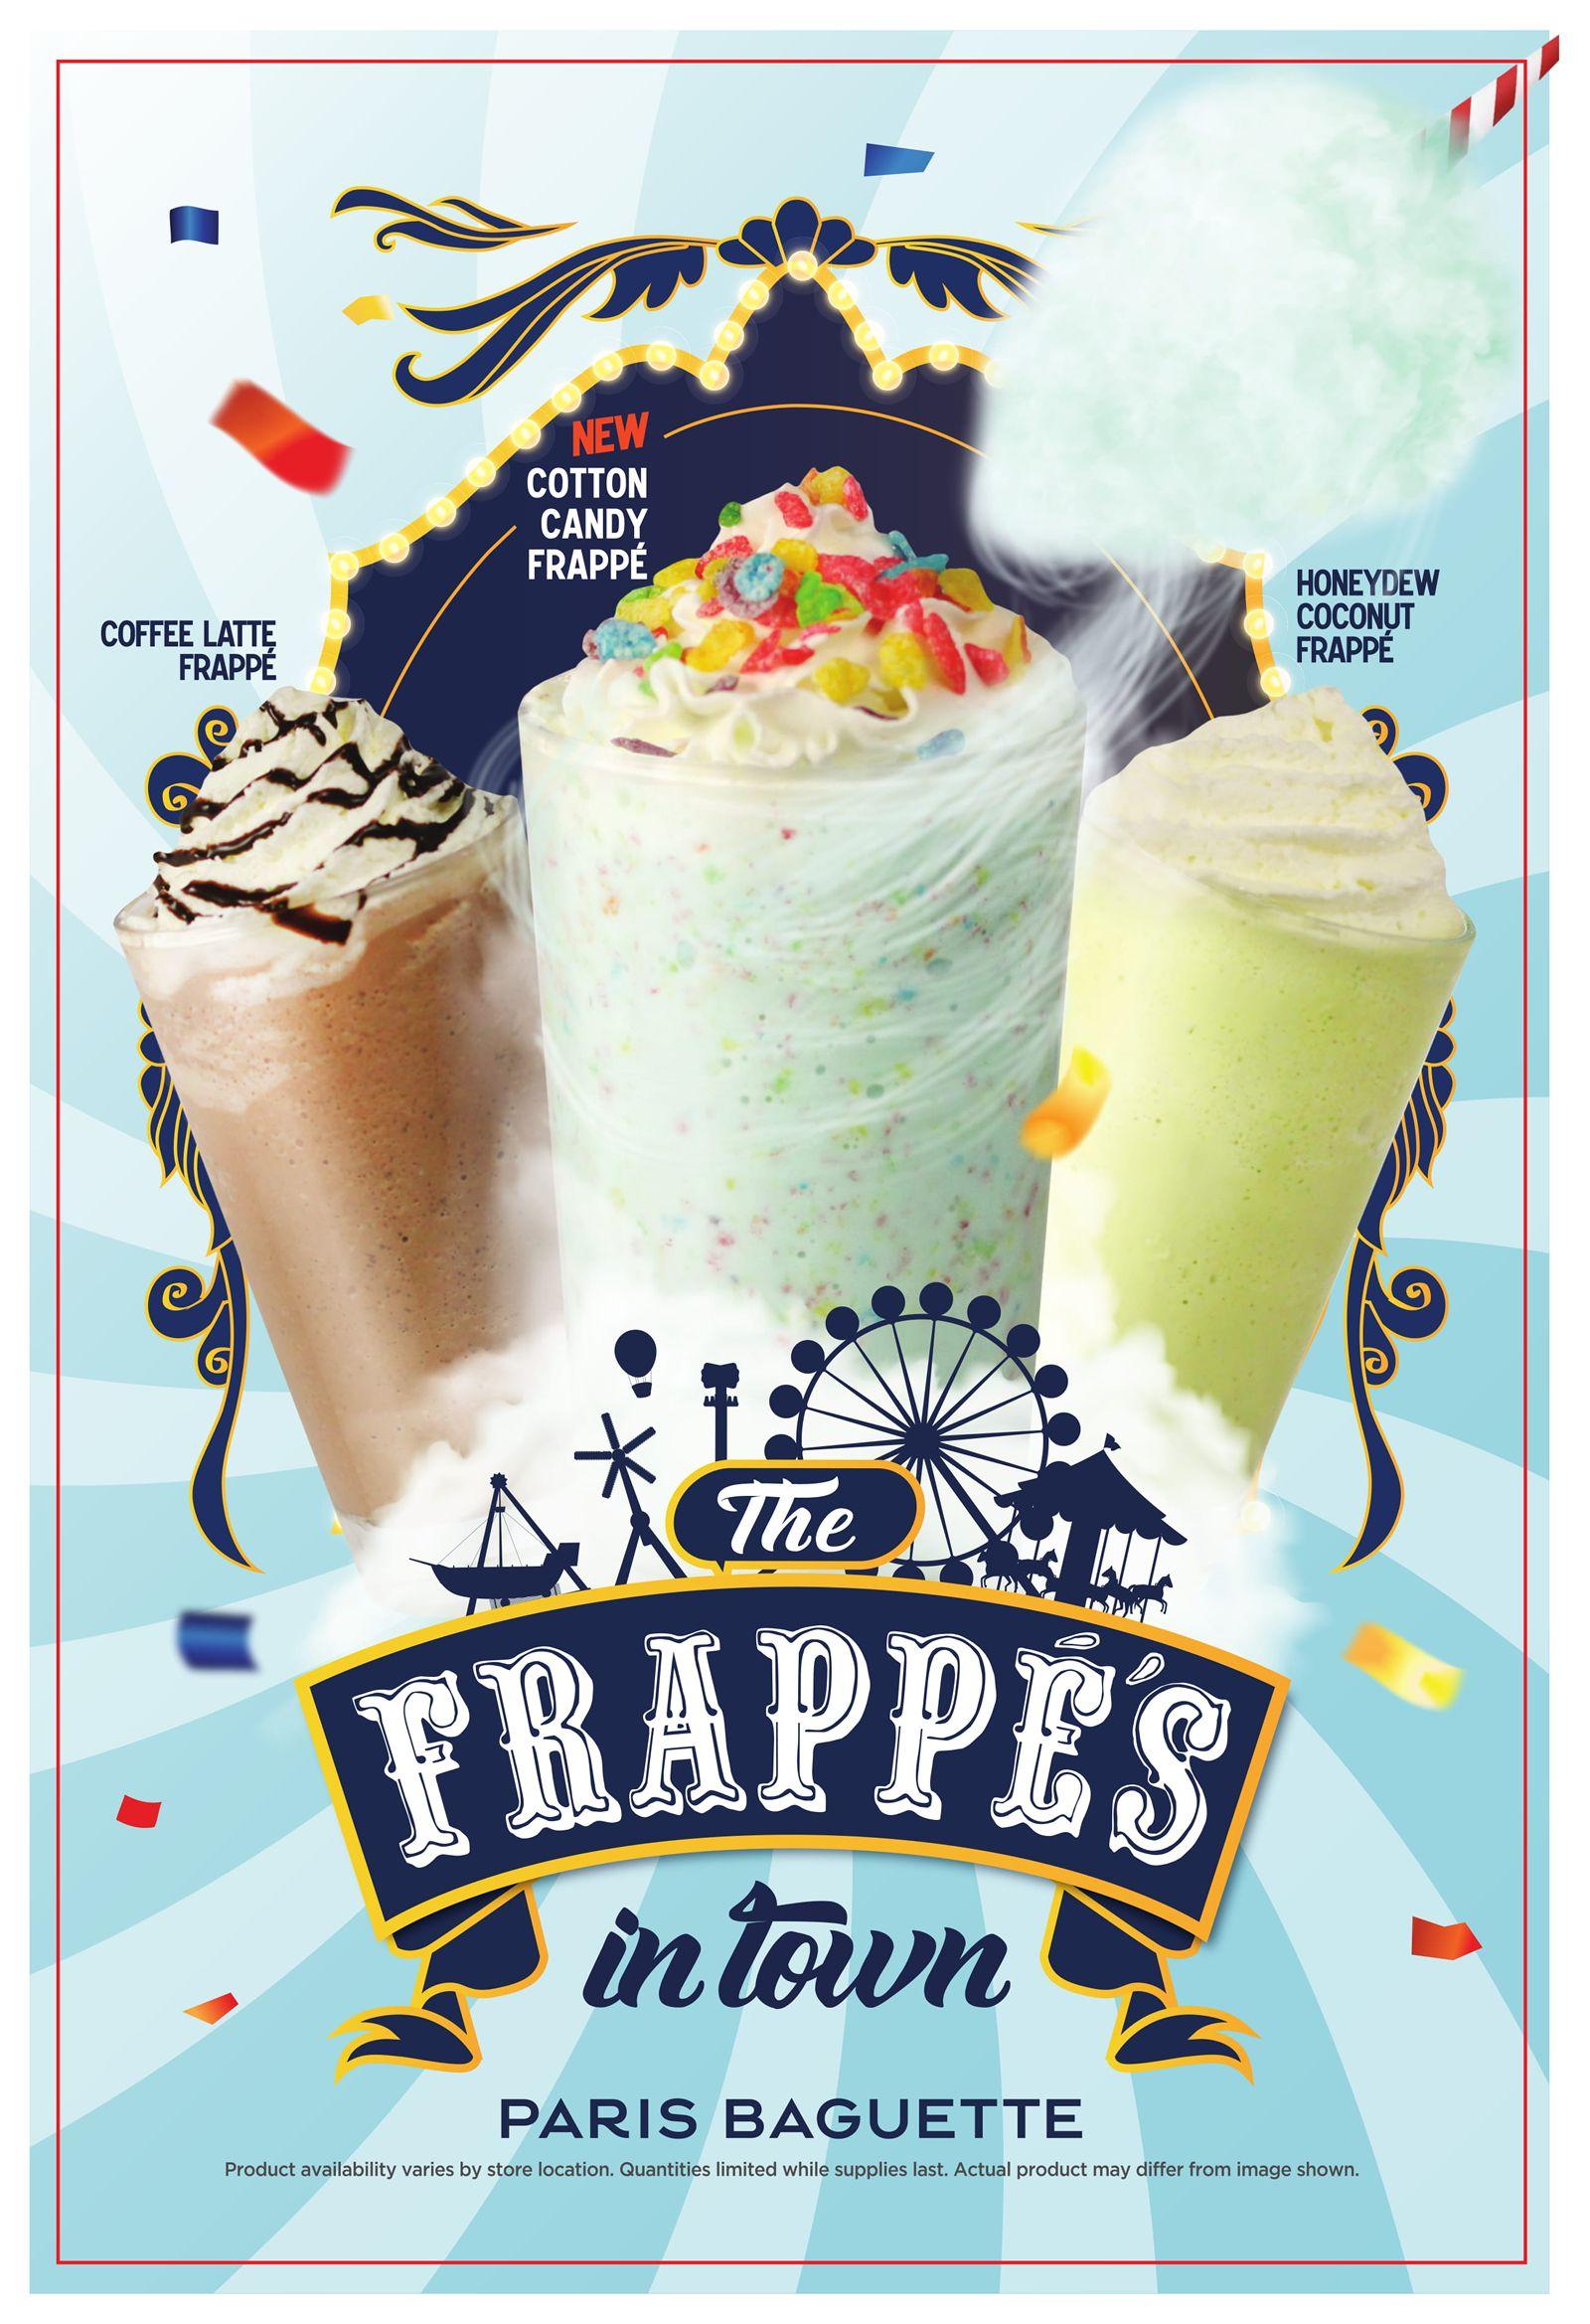 Paris Baguette Offers Frappe Lovers New Summer Flavors